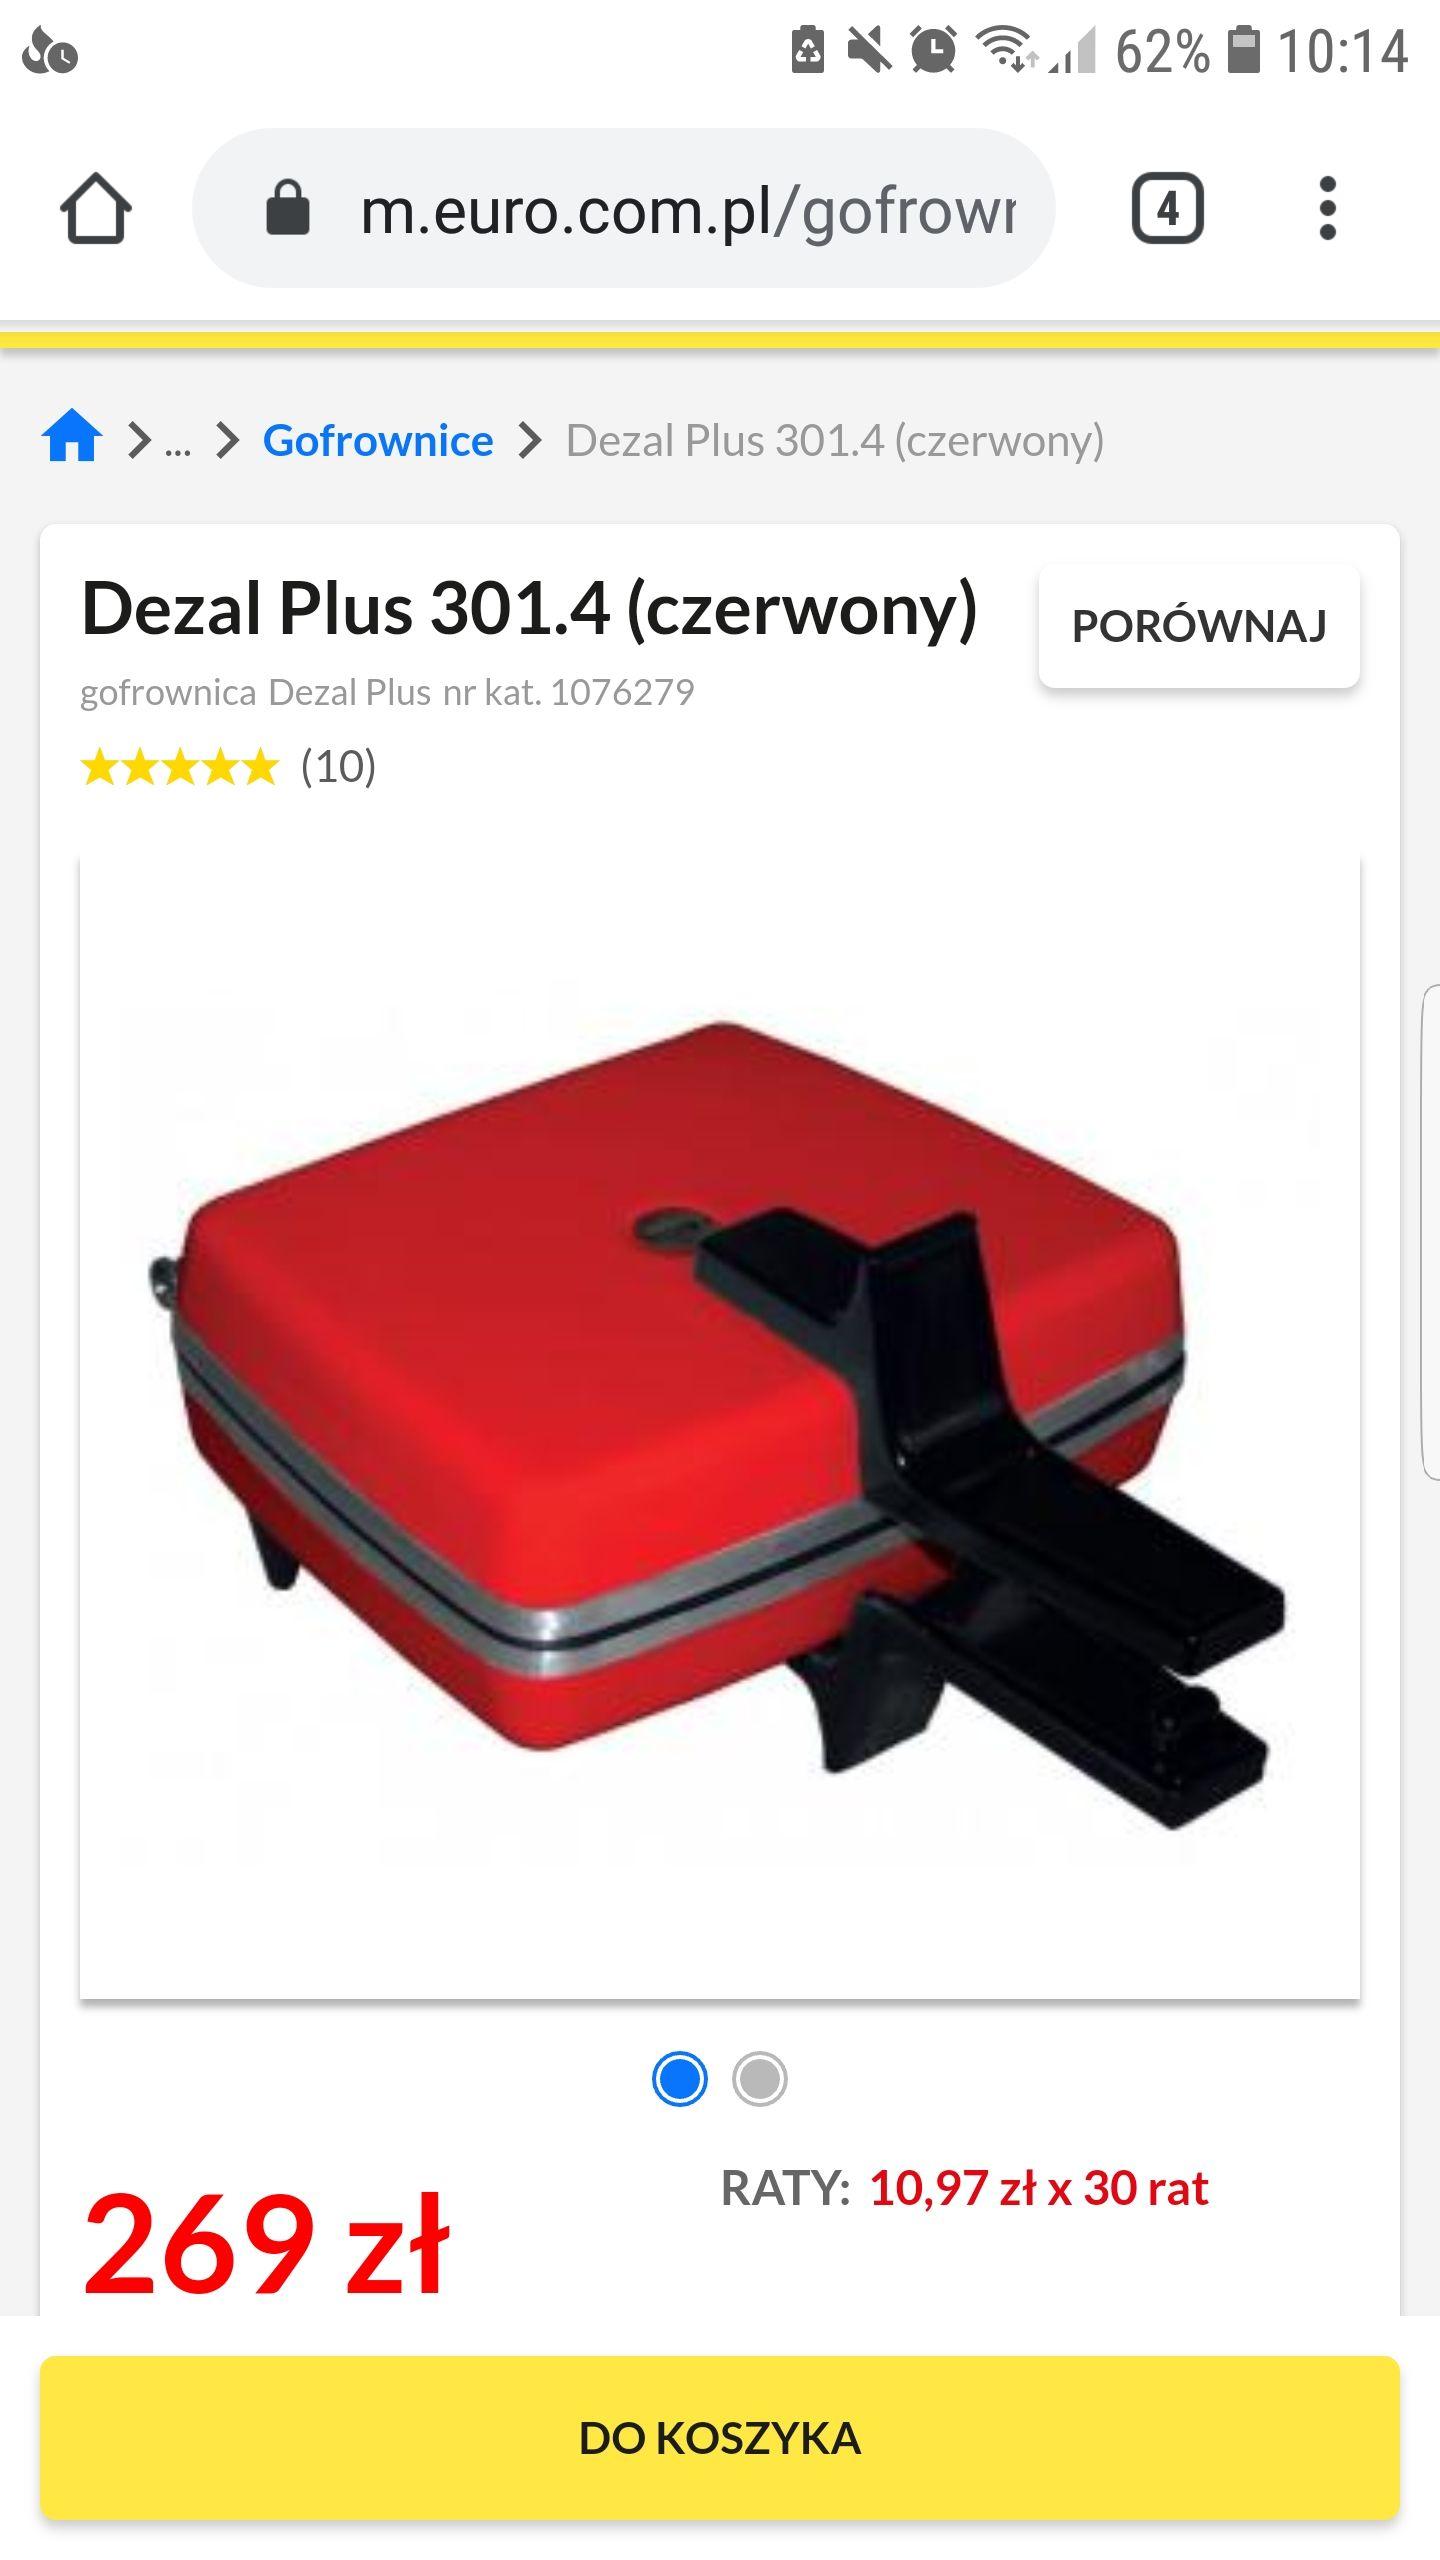 Gofrownica Dezal Plus 301'4